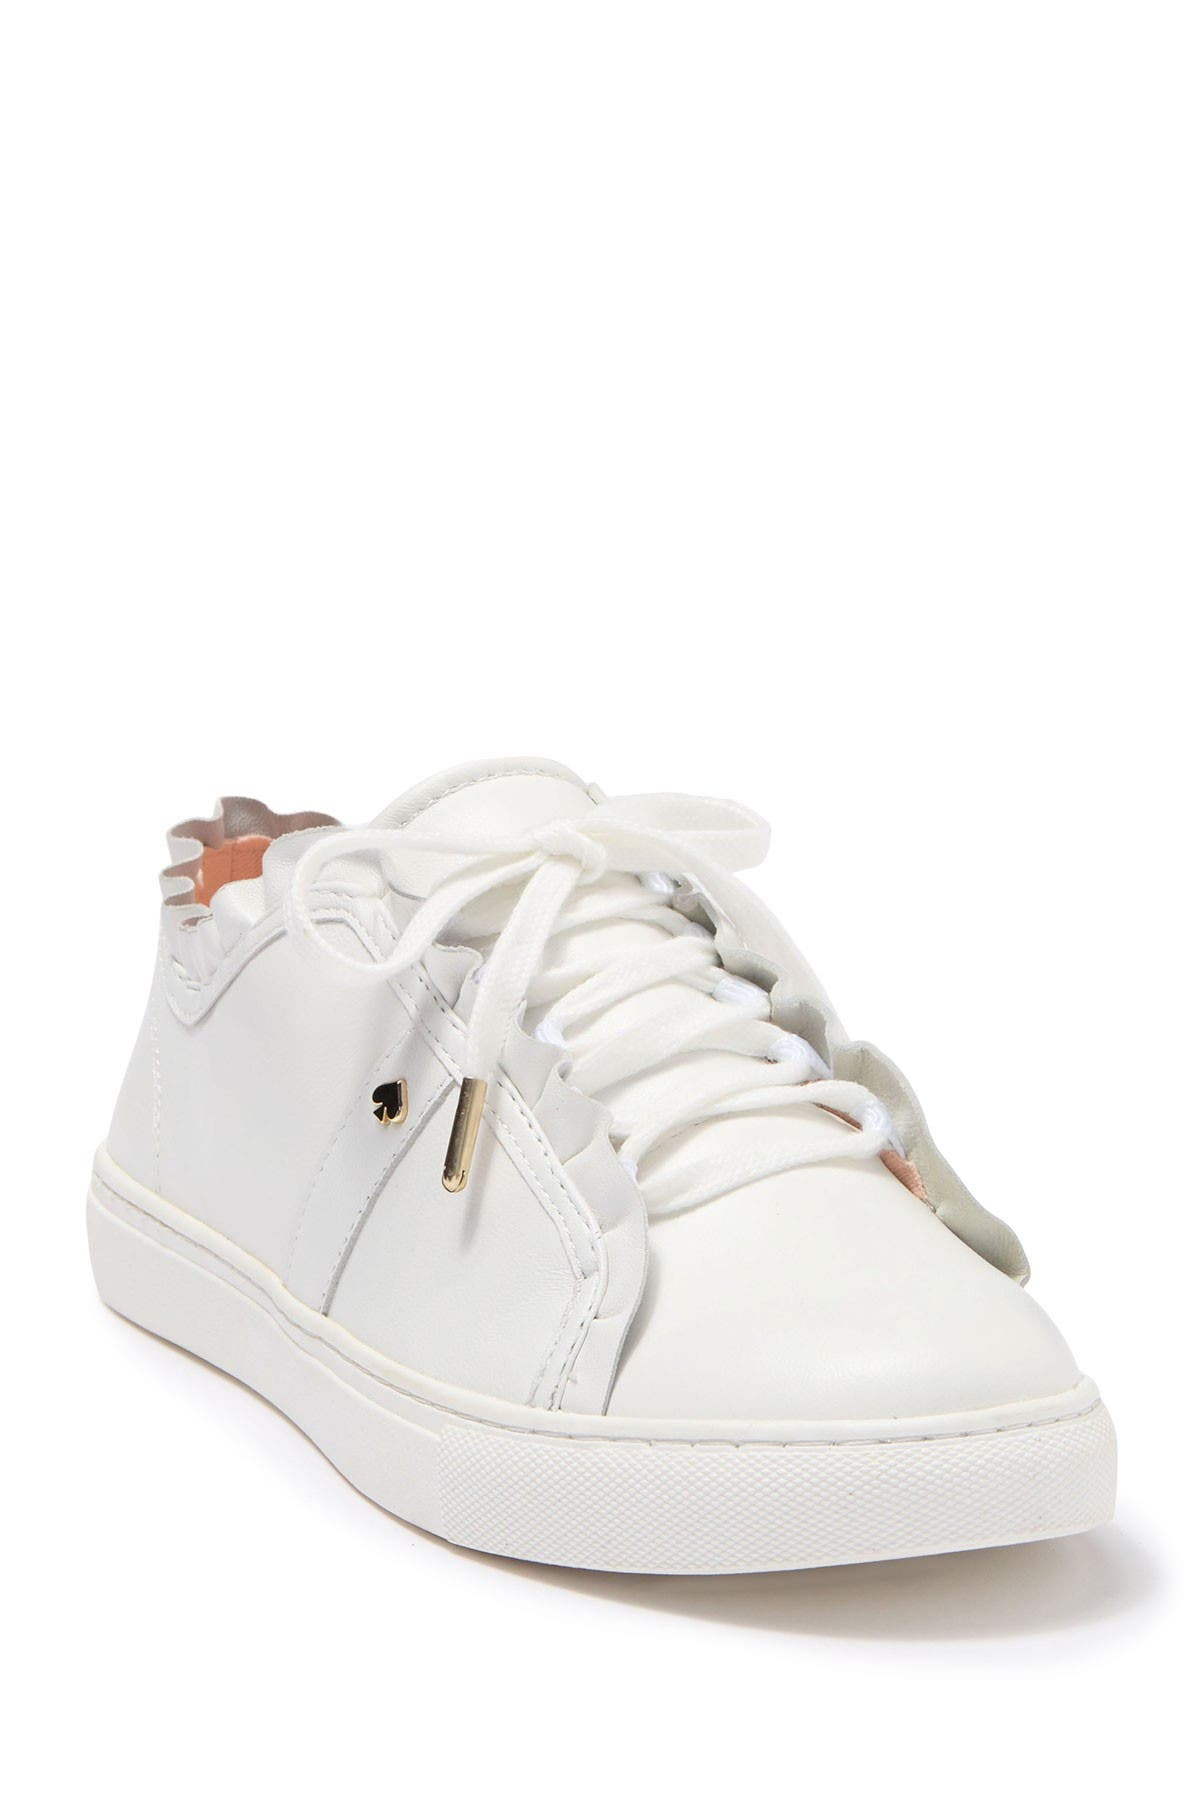 kate spade new york sneakers